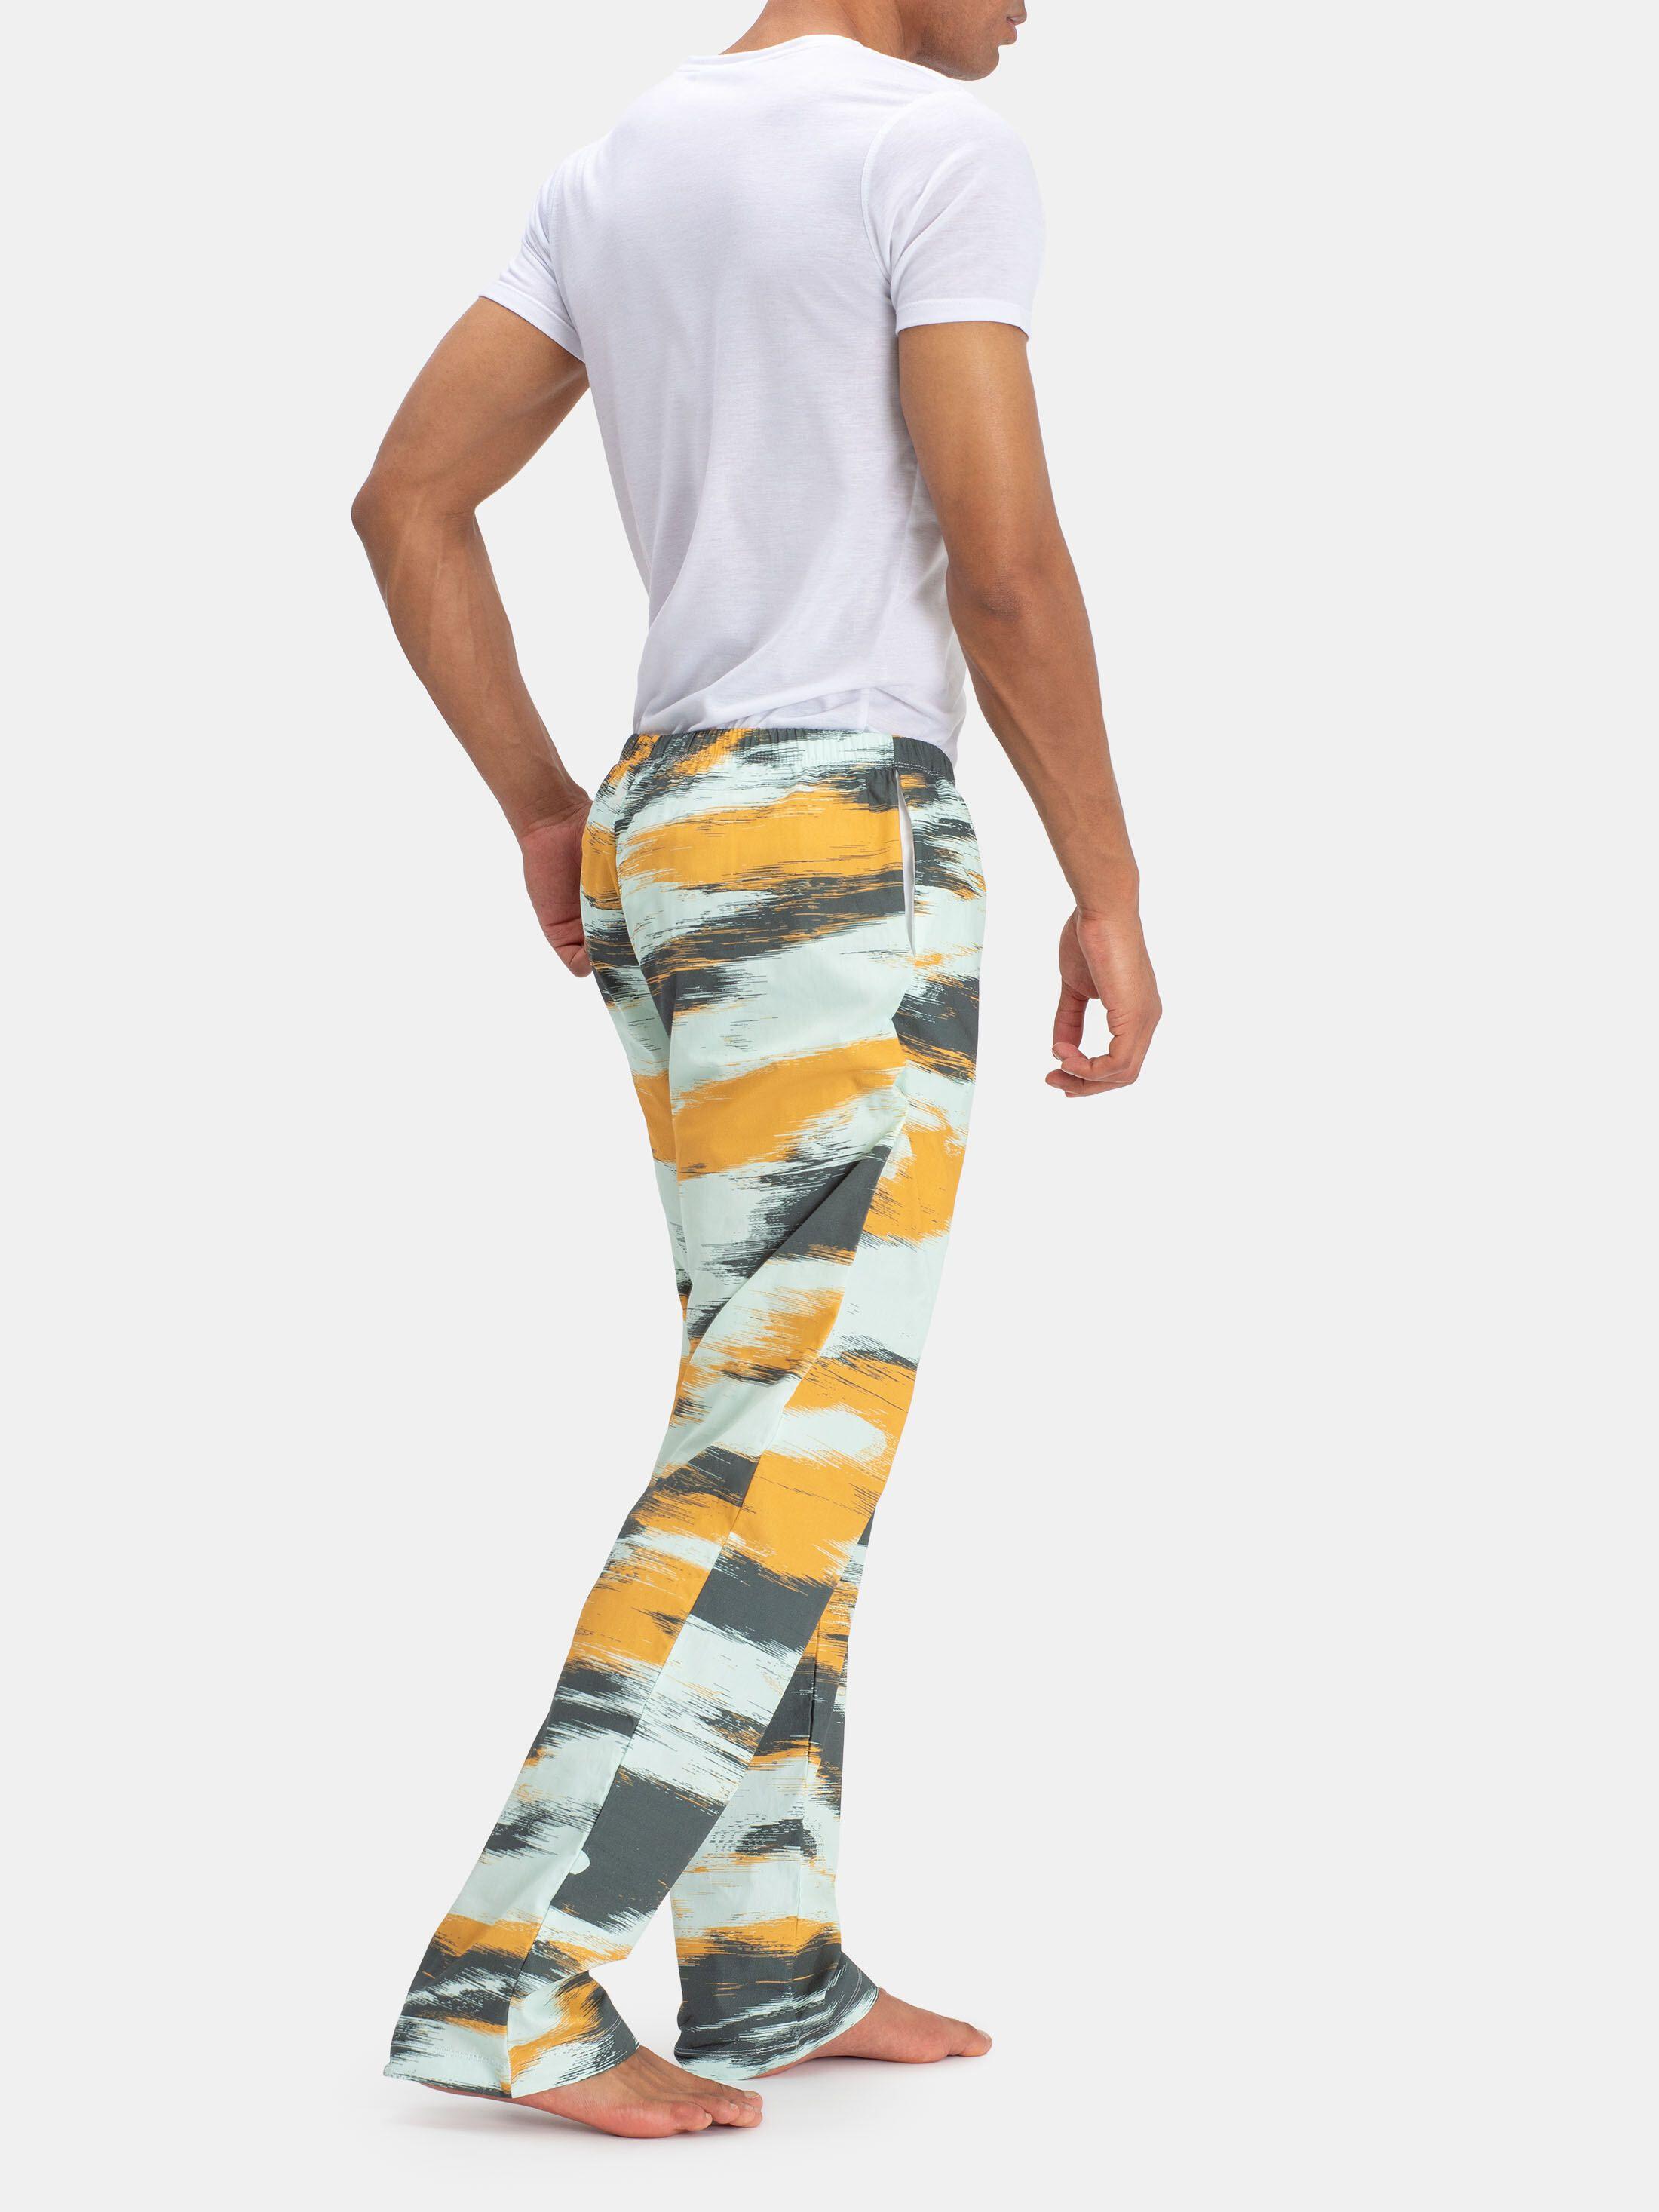 Pijamas Personalizados Online